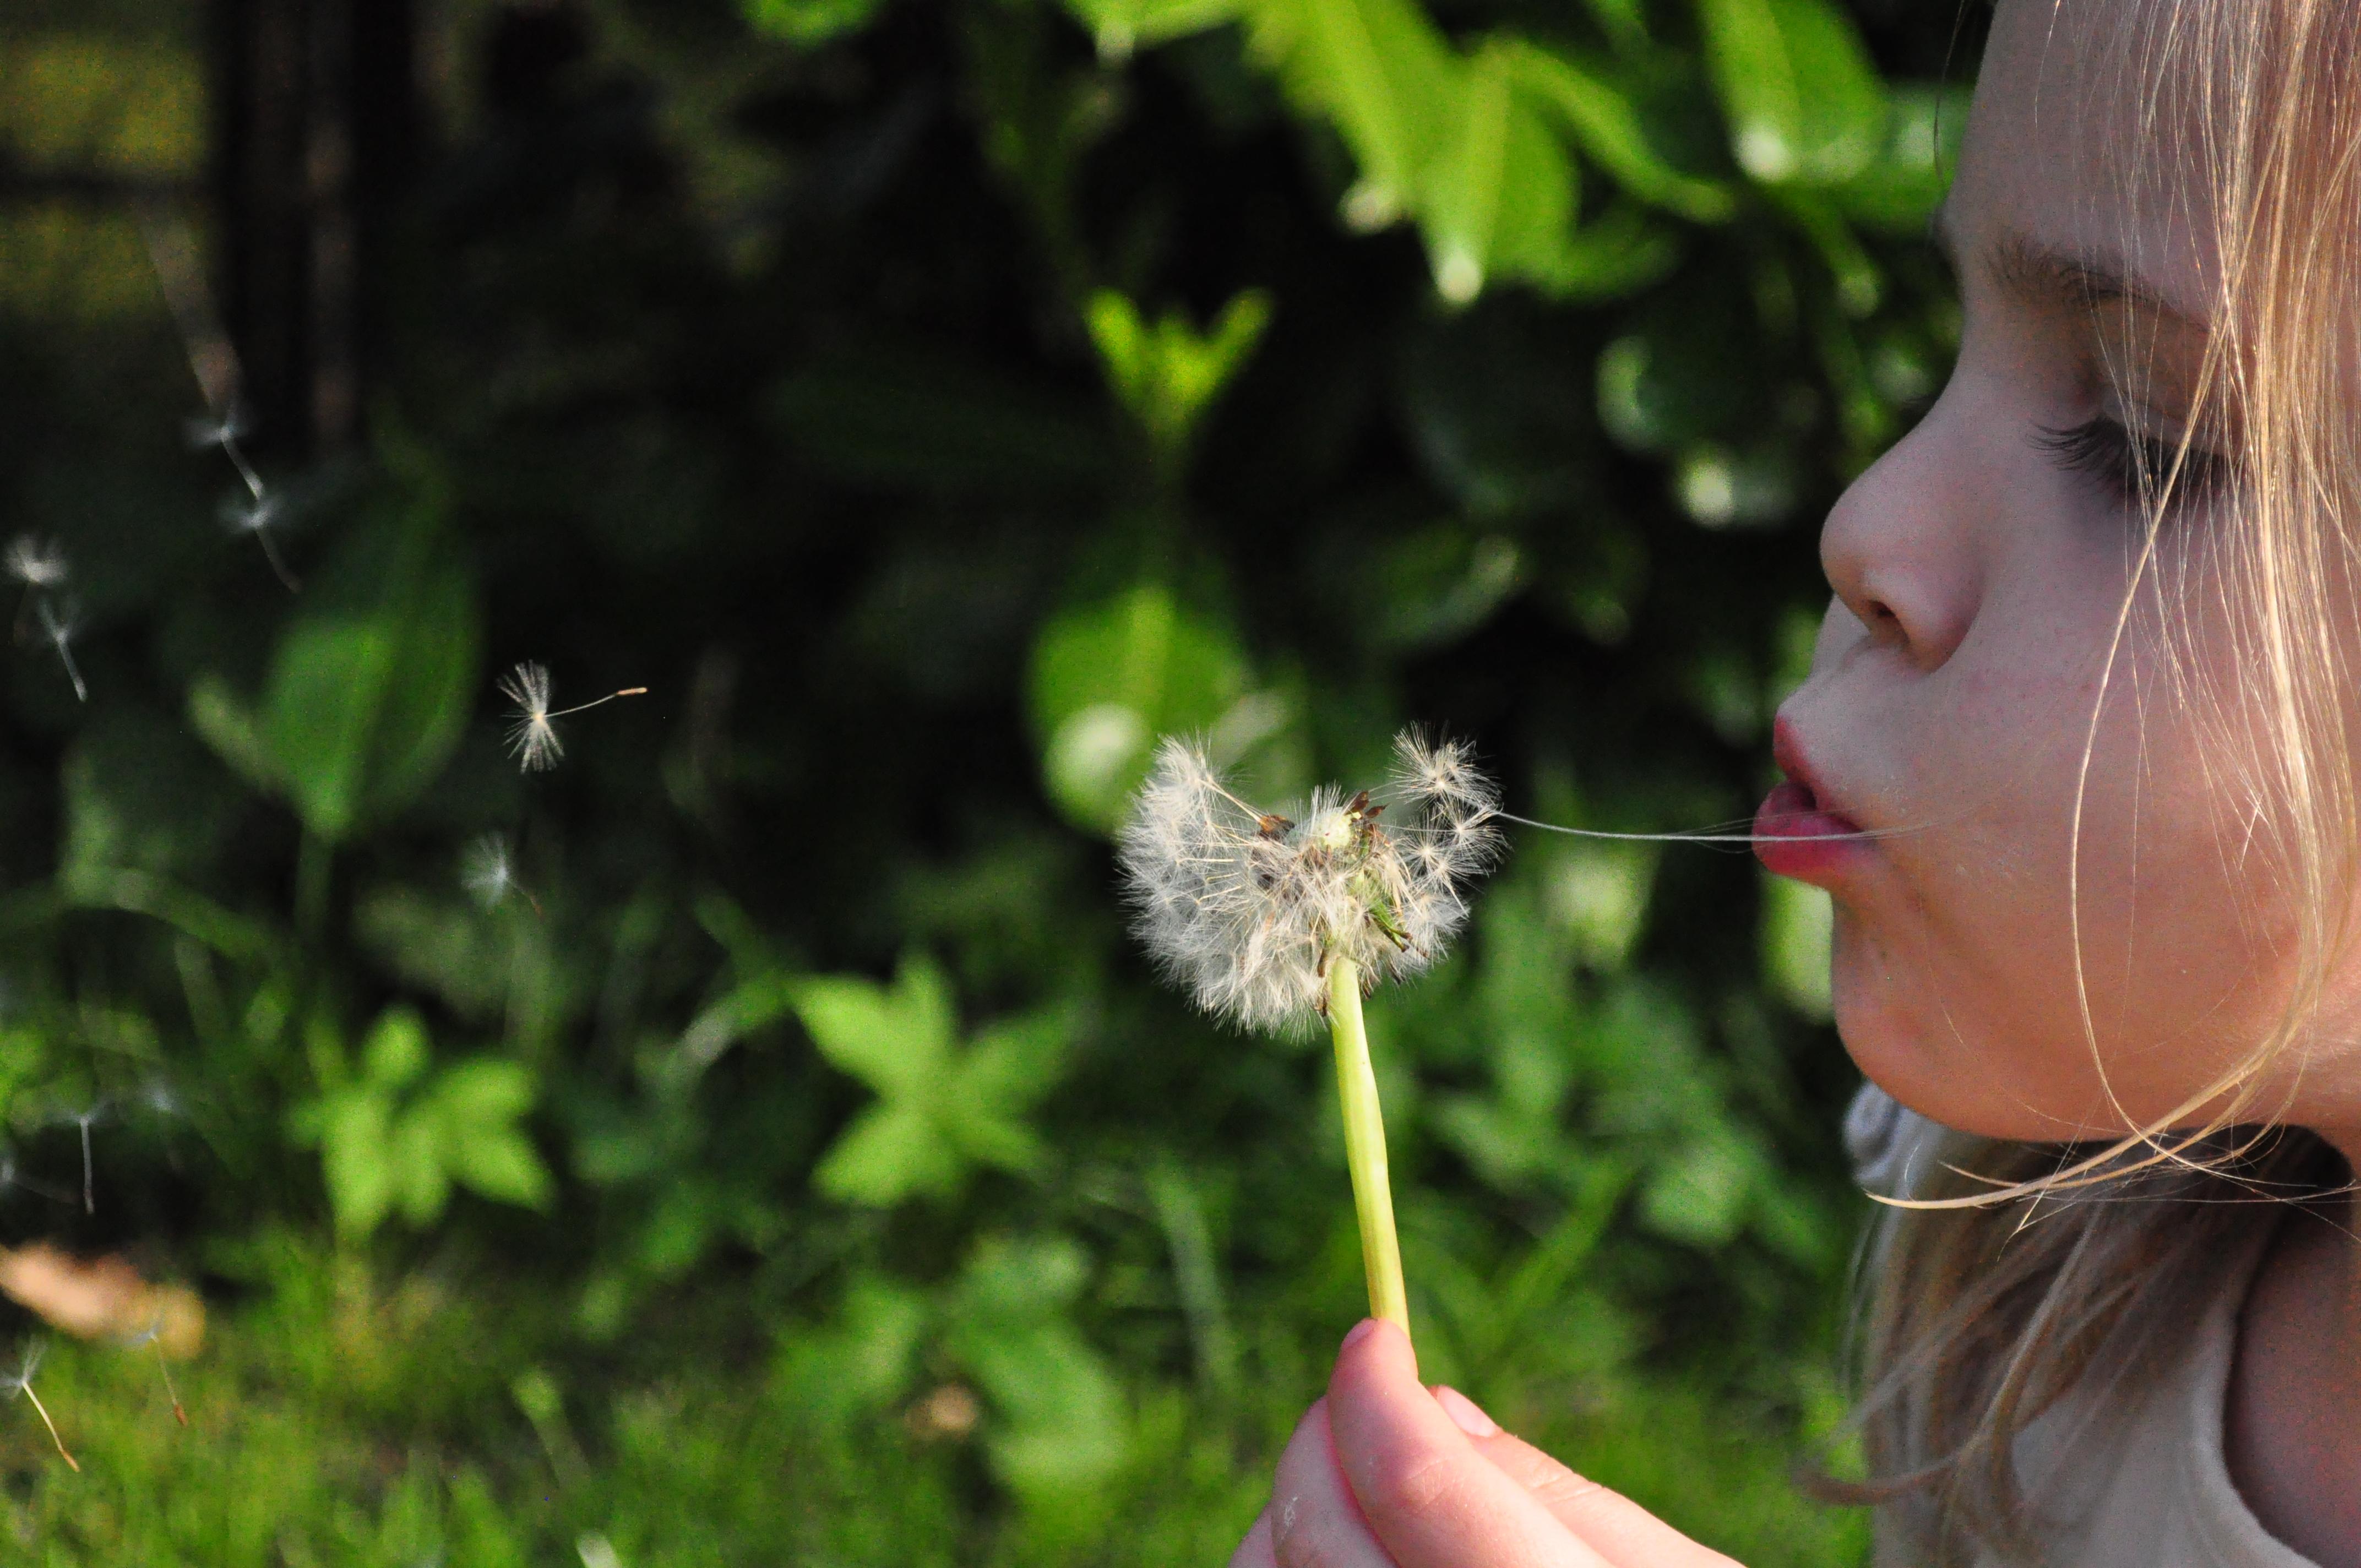 Blowing Child Cute Dandelion Flower · Free Photo